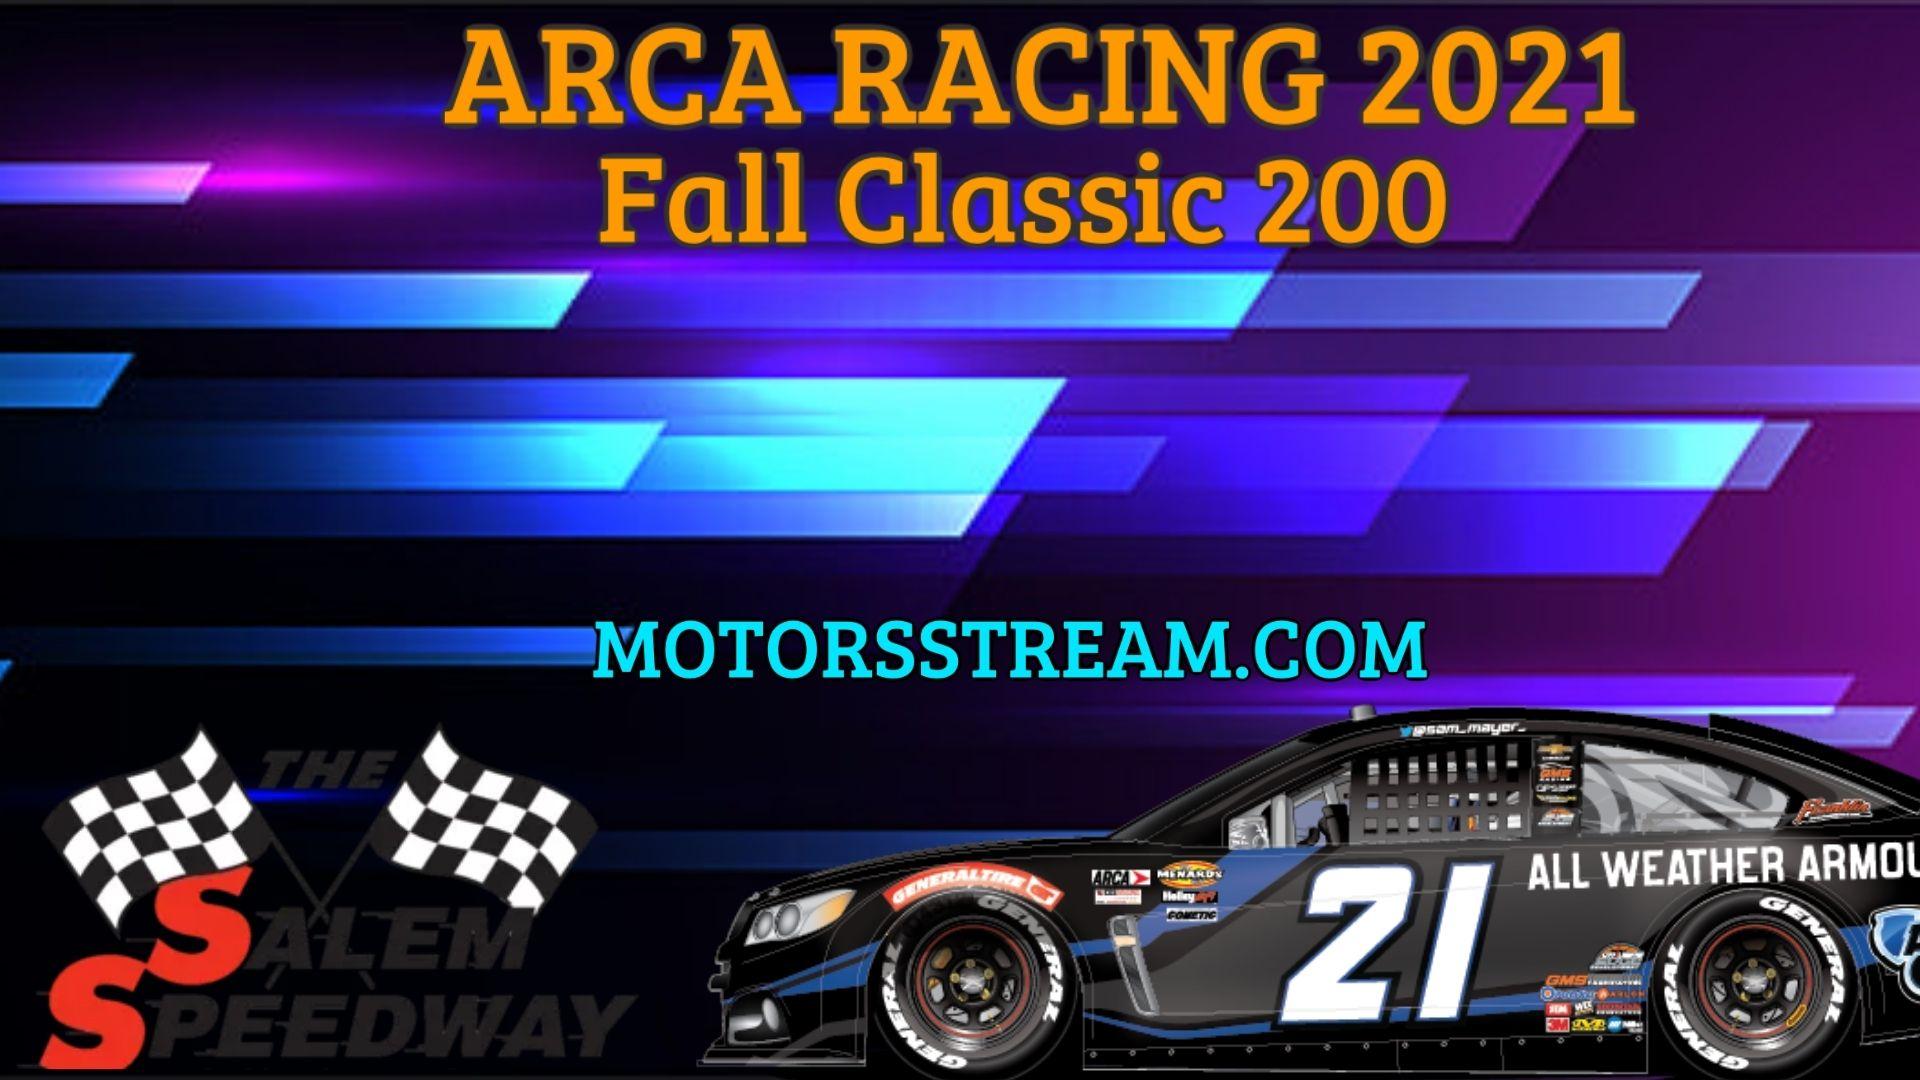 Fall Classic 200 Live Stream 2021 Arca Racing